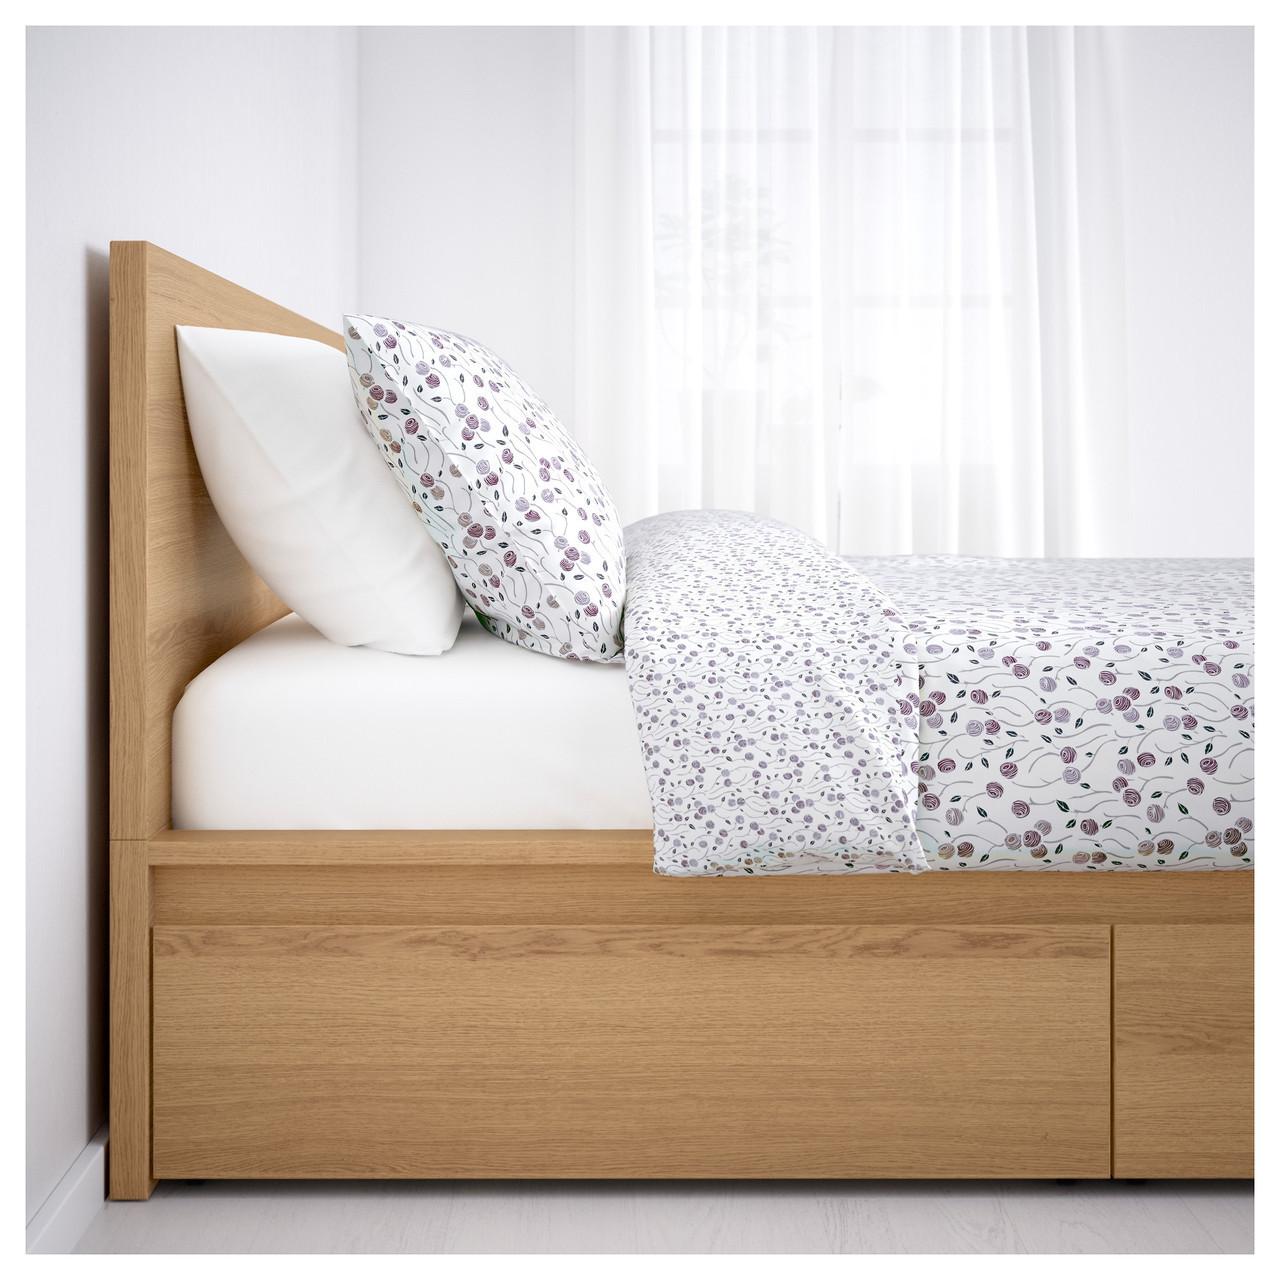 MALM Каркас кровати, высота, 4 емкости, дубовый шпон × белый, Leirsund 391.754.28